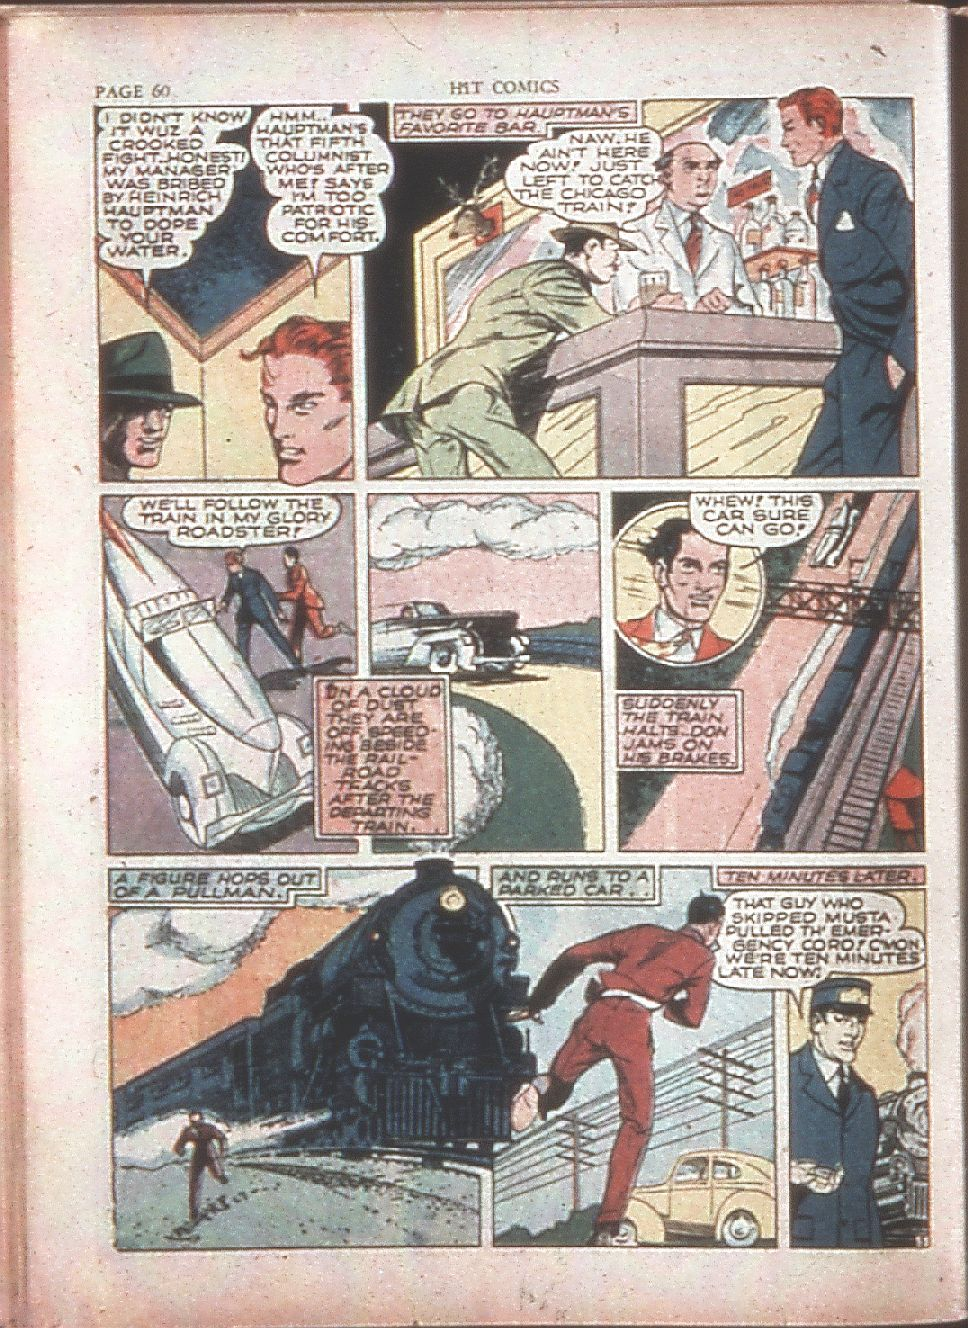 Read online Hit Comics comic -  Issue #15 - 62